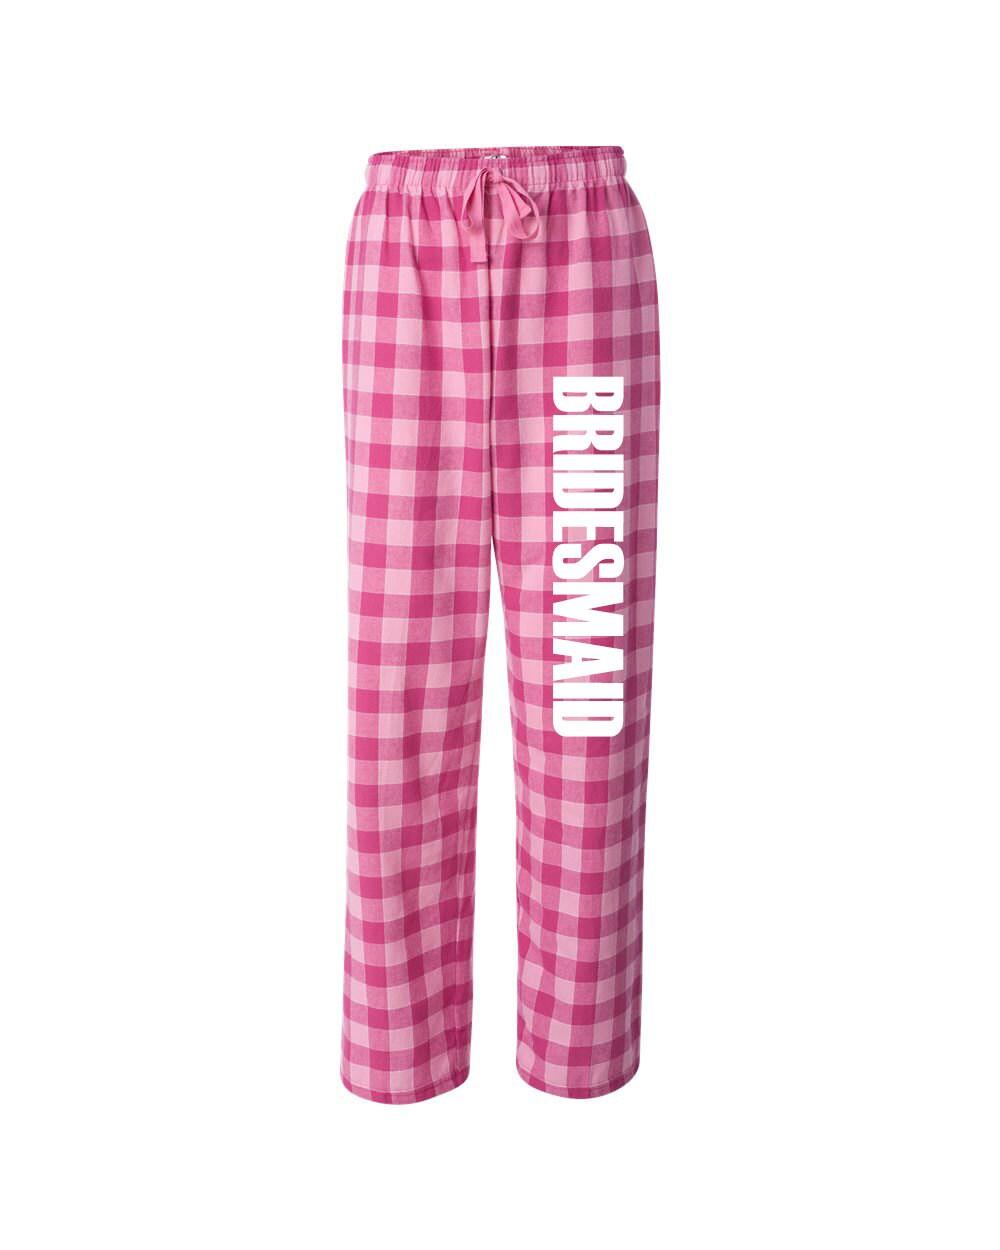 Monogrammed pajamas | Etsy